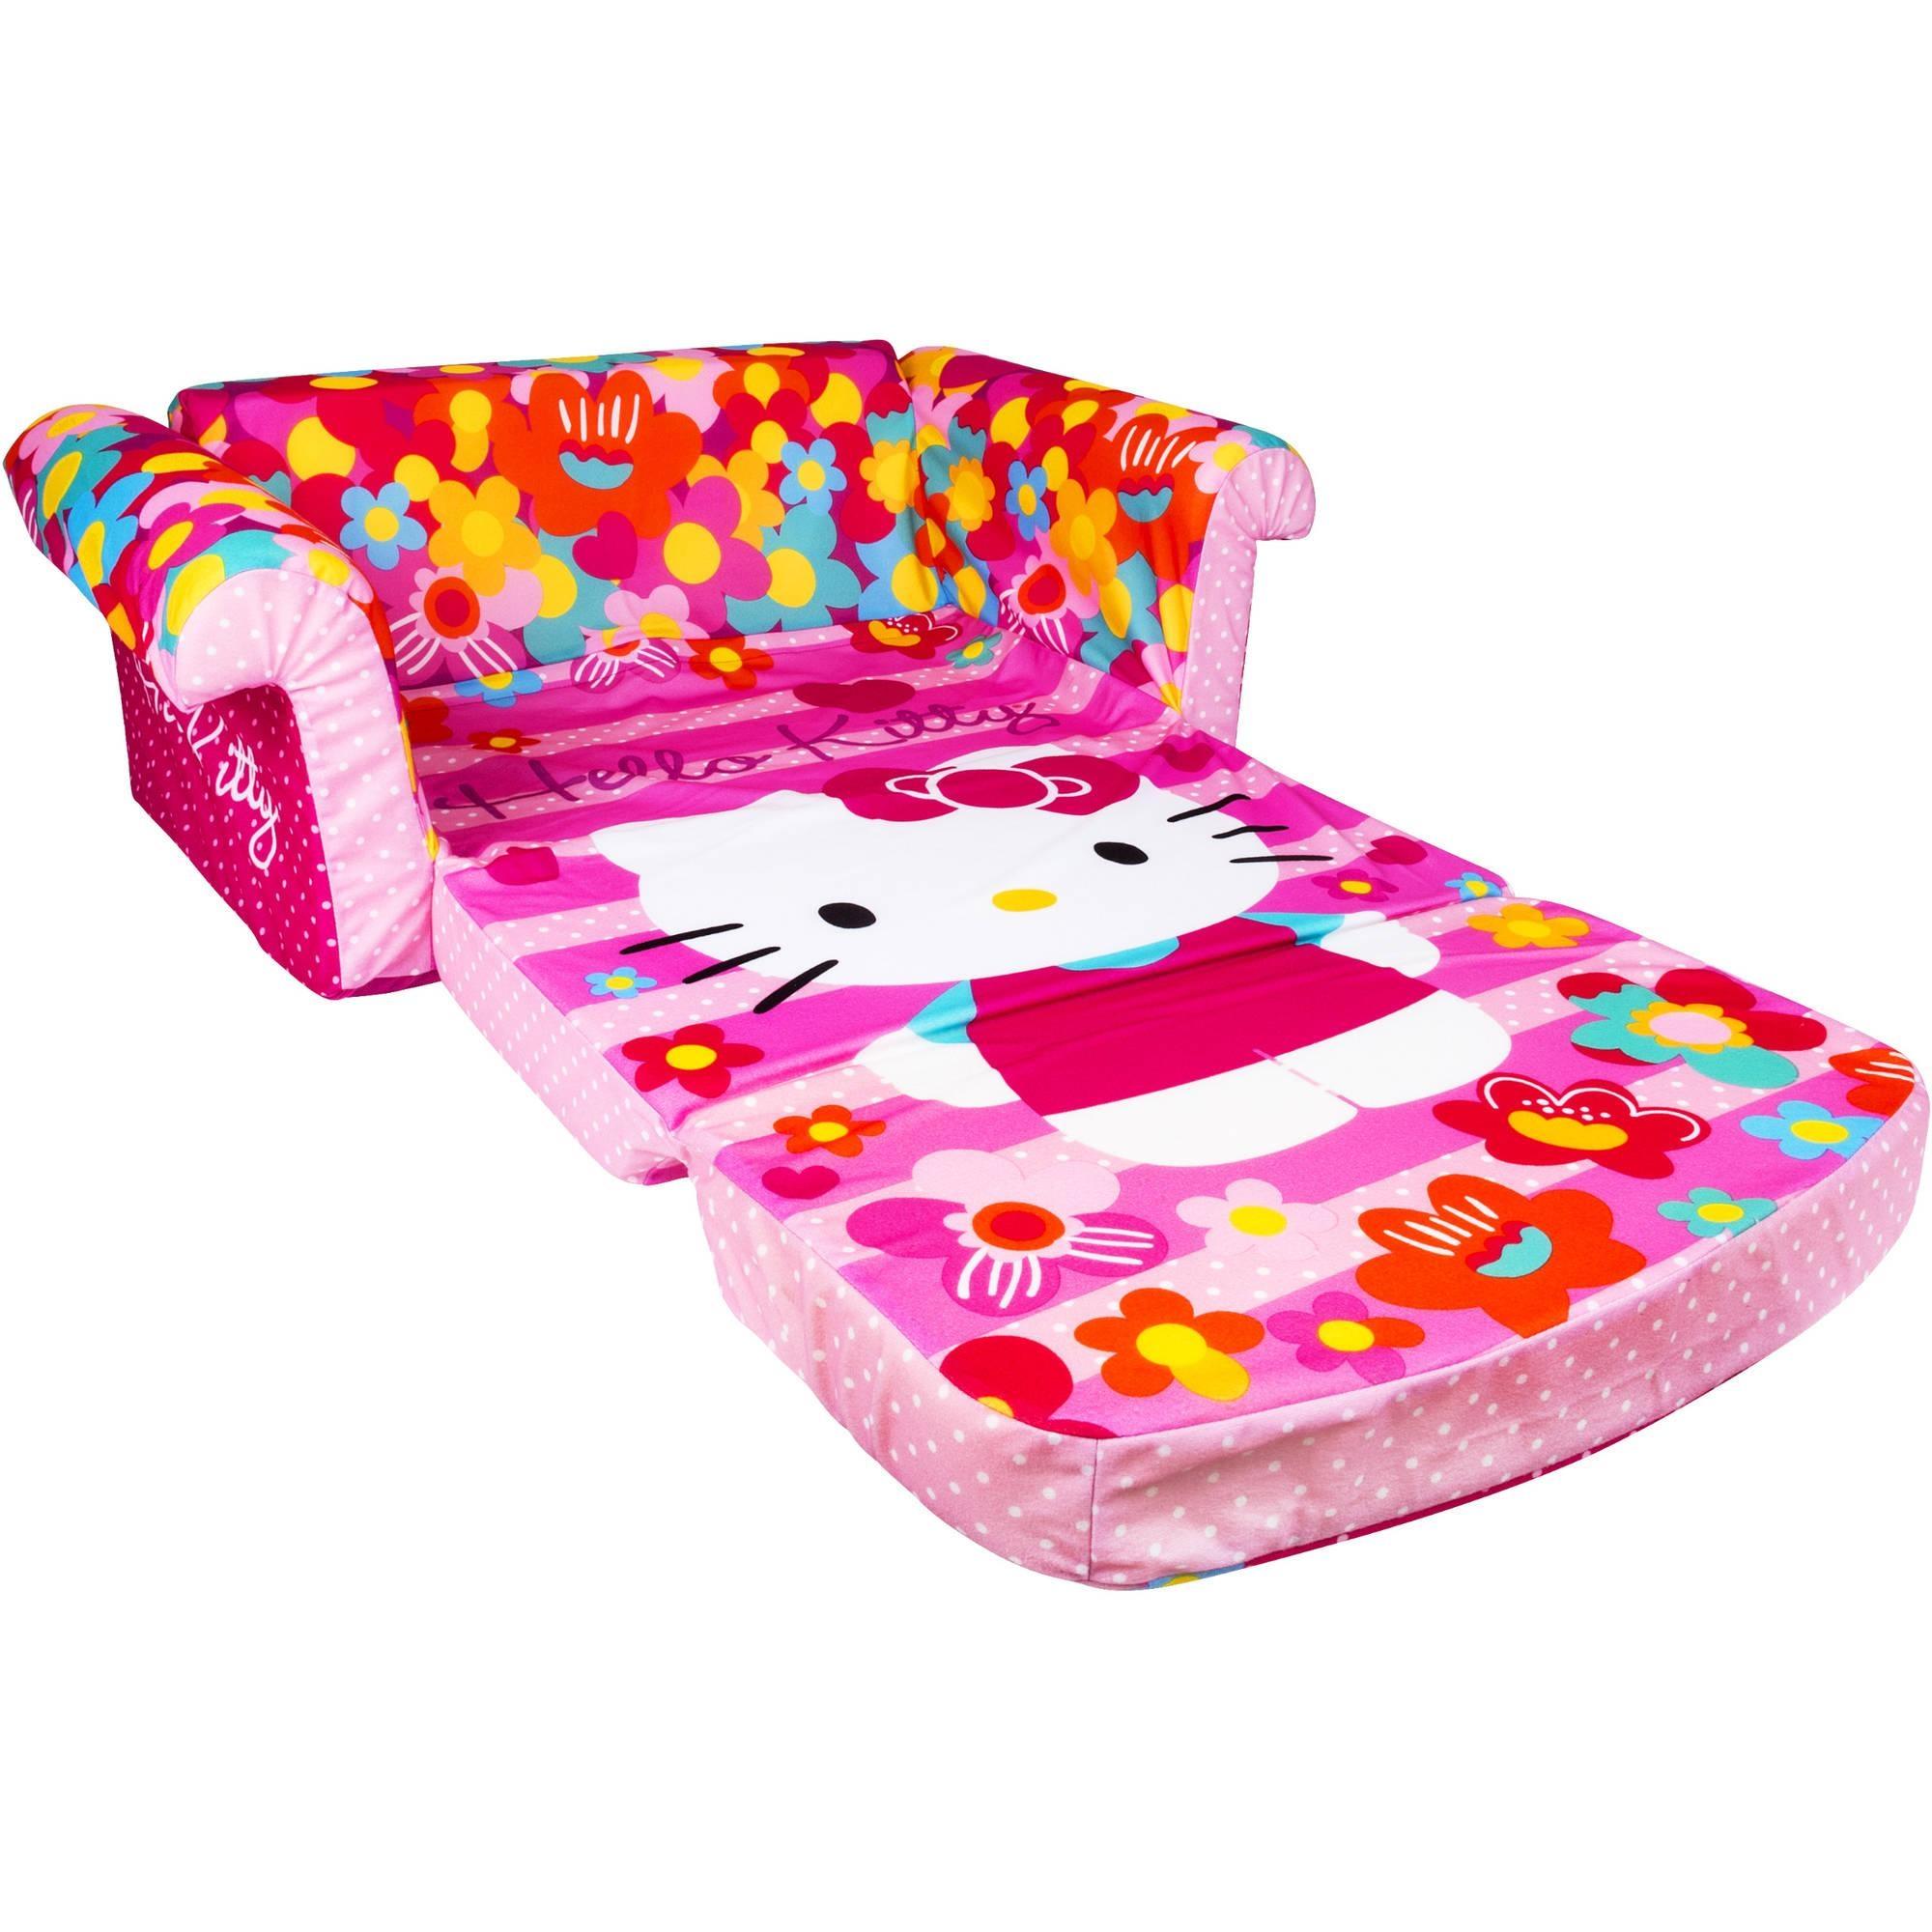 Sofas Center : Flip Open Sofa Spin Master Marshmallow Furniture For Princess Flip Open Sofas (Image 13 of 20)